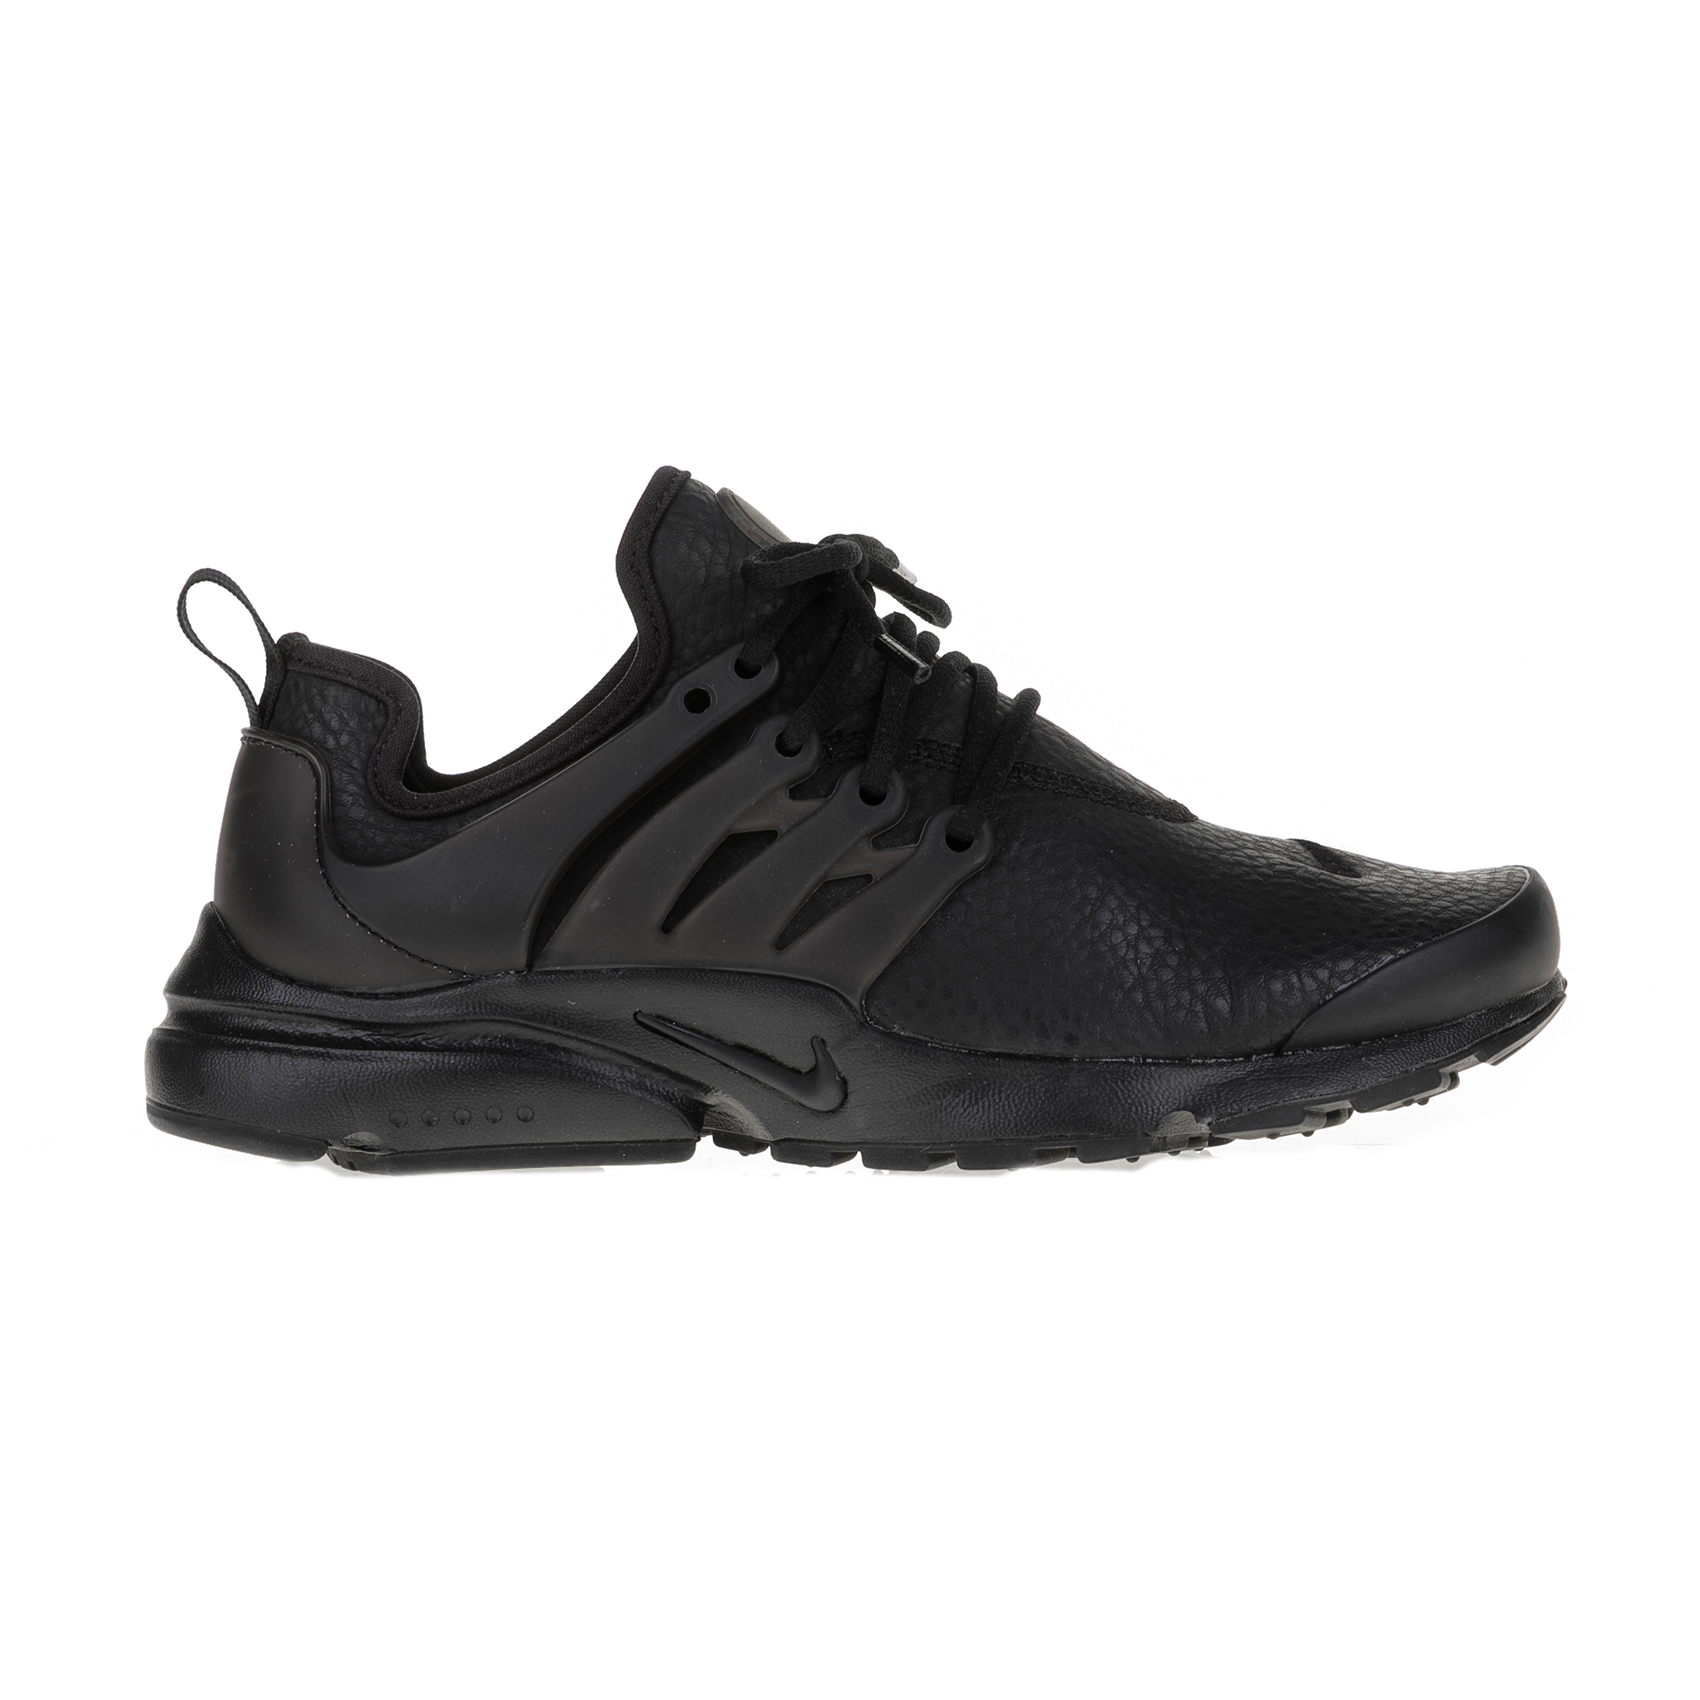 NIKE – Γυναικεία παπούτσια Nike AIR PRESTO PRM μάυρα